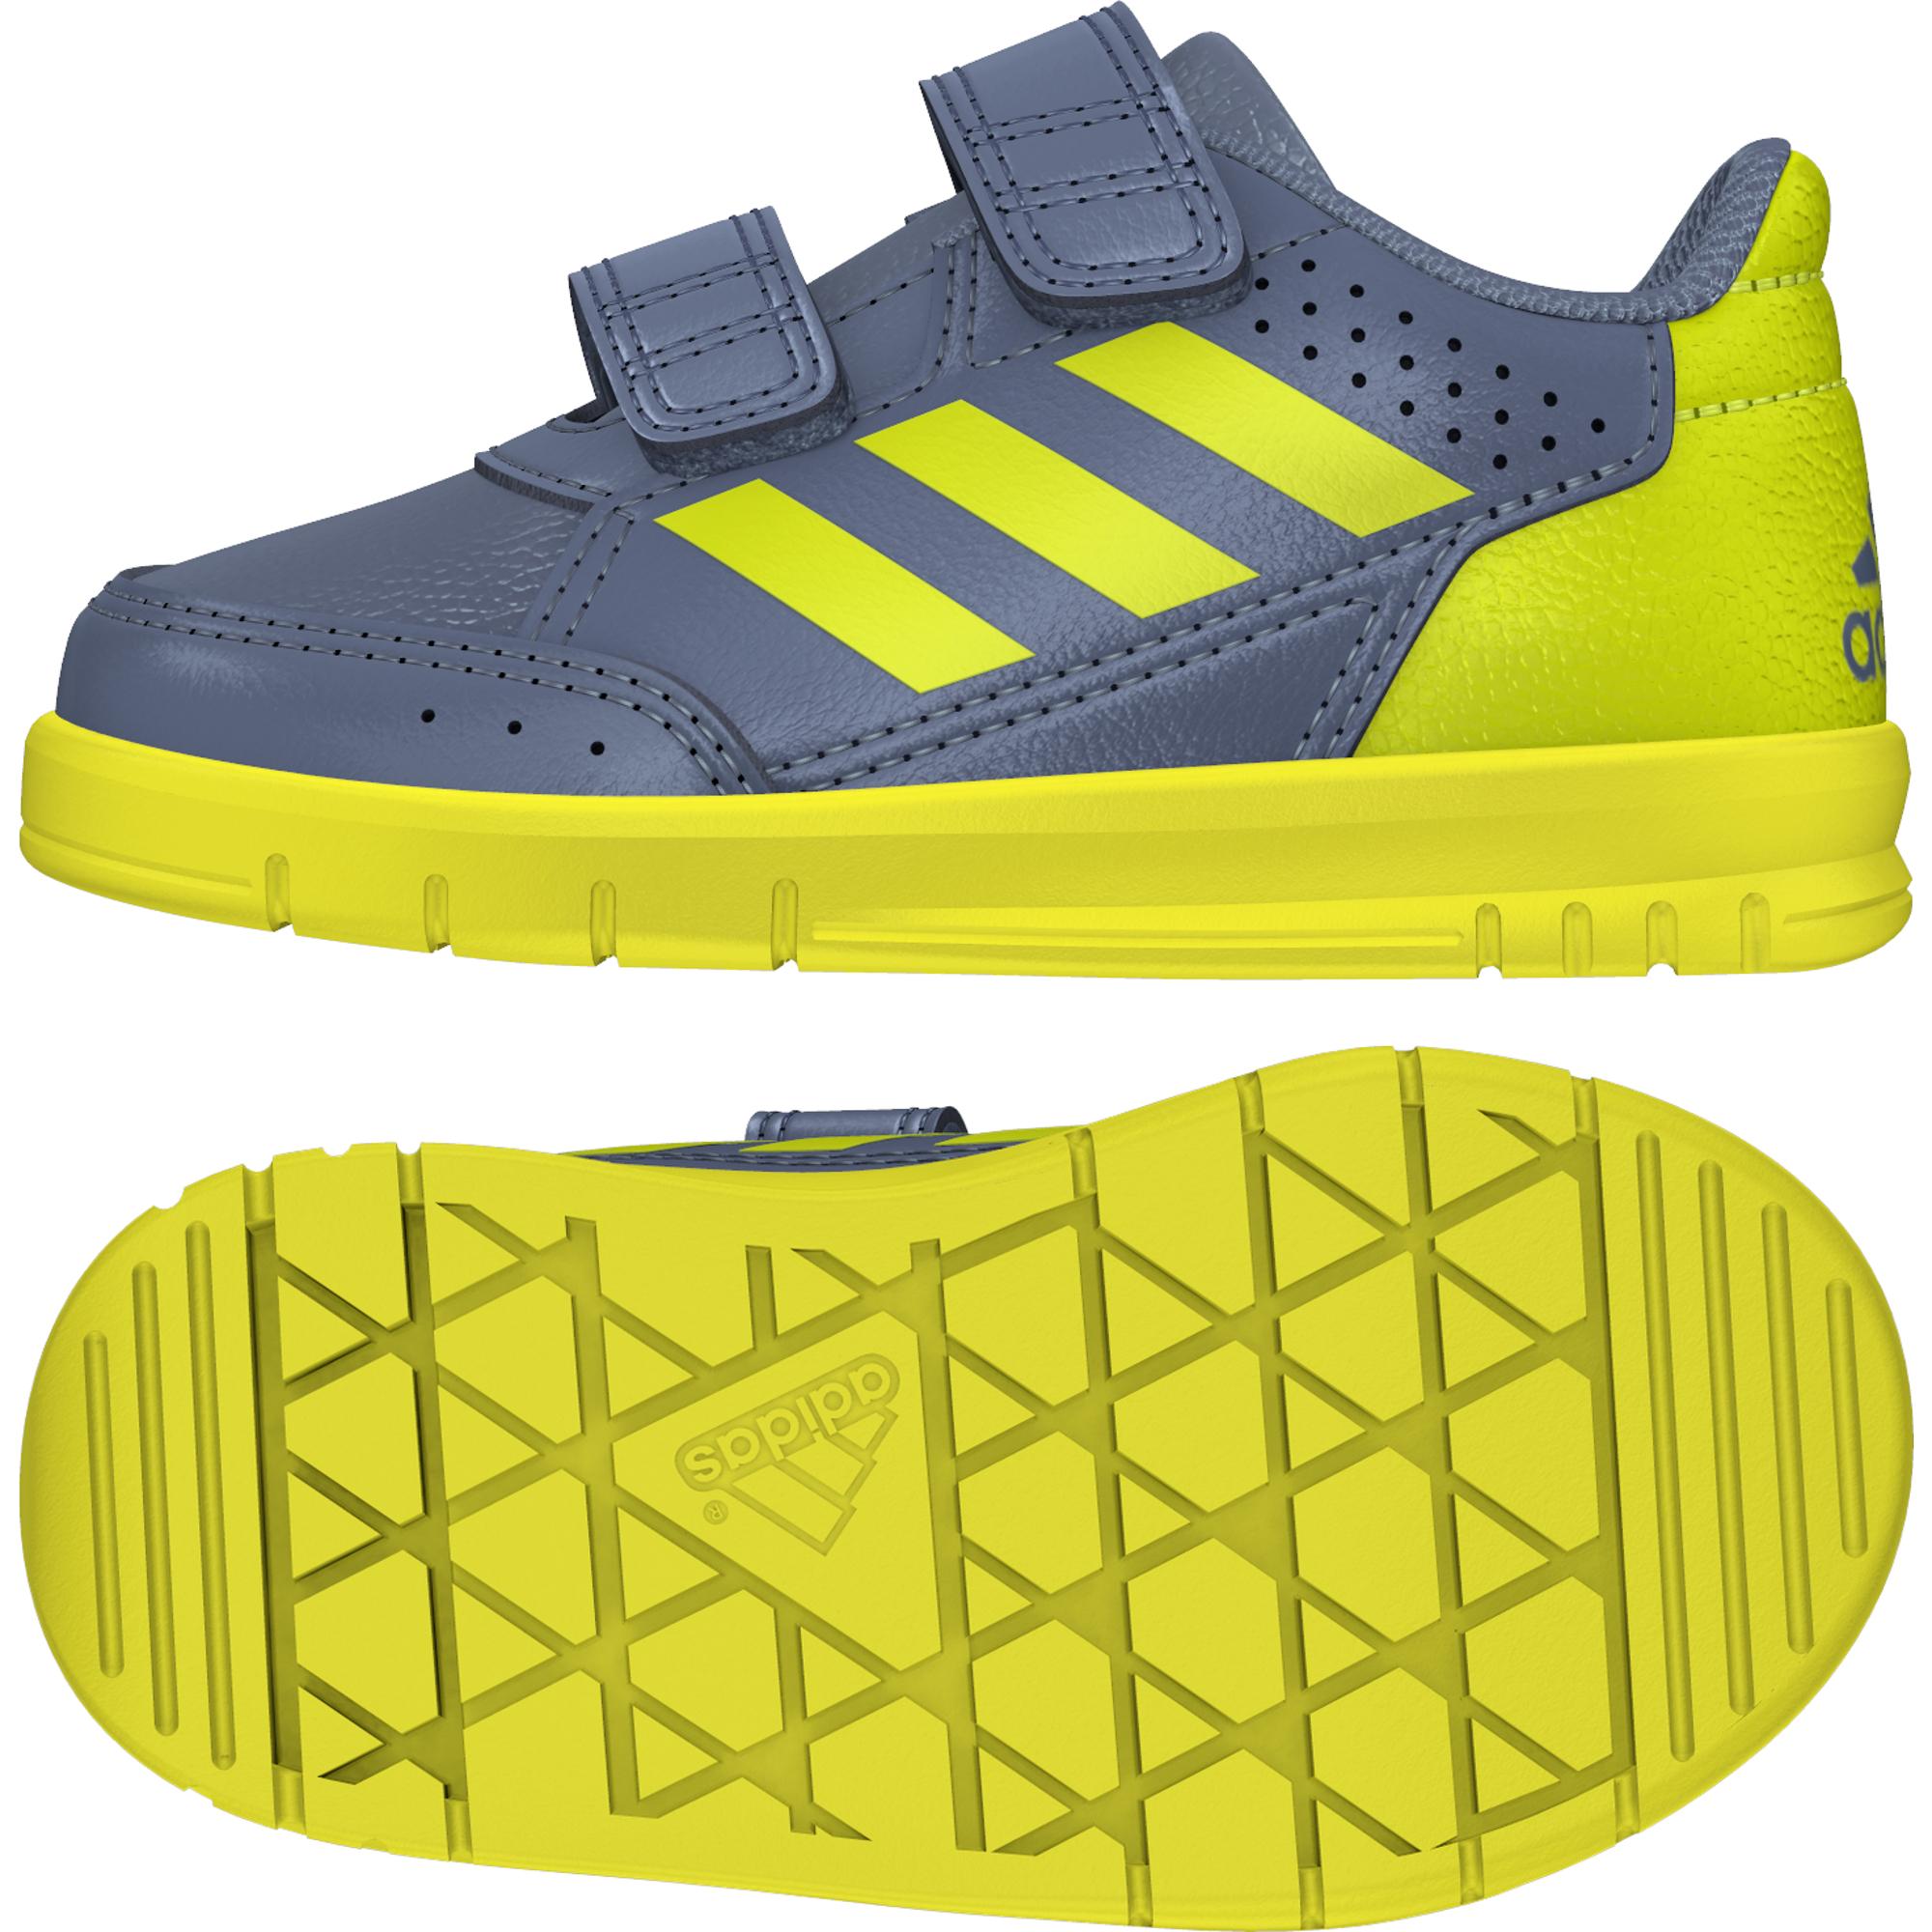 8e56d9cd9eba adidas AltaSport CF I sivá-žltá